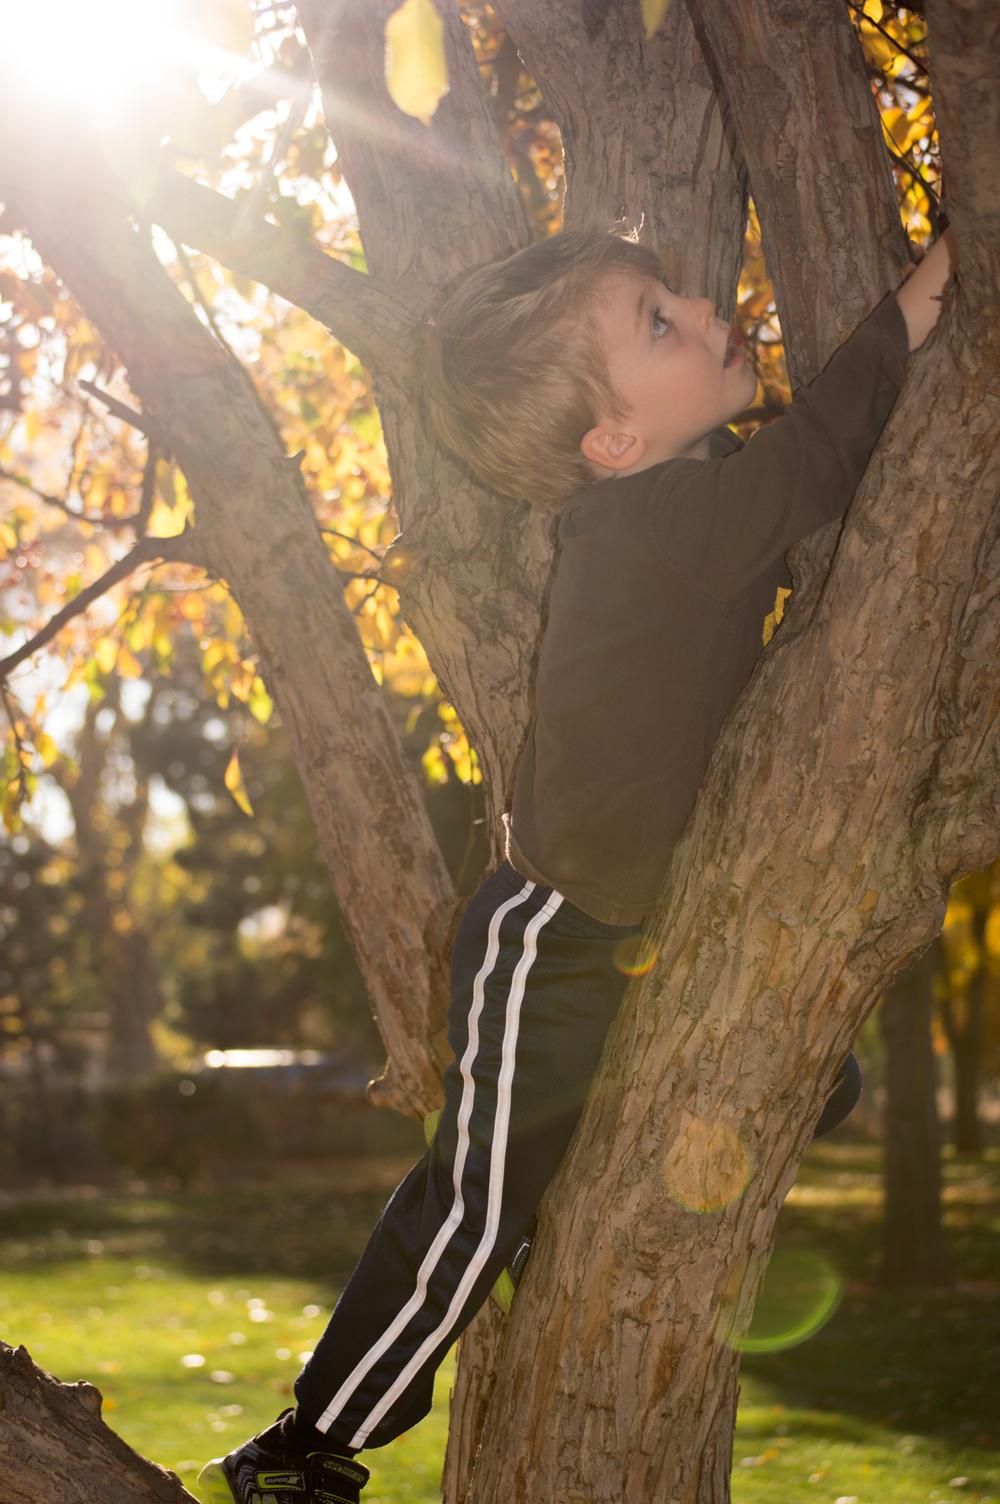 Desmond Climbs a Tree  Nikon D3200 • Nikon 55-200mm lens • 55mm • F/4.5 • 1/200s • ISO 100